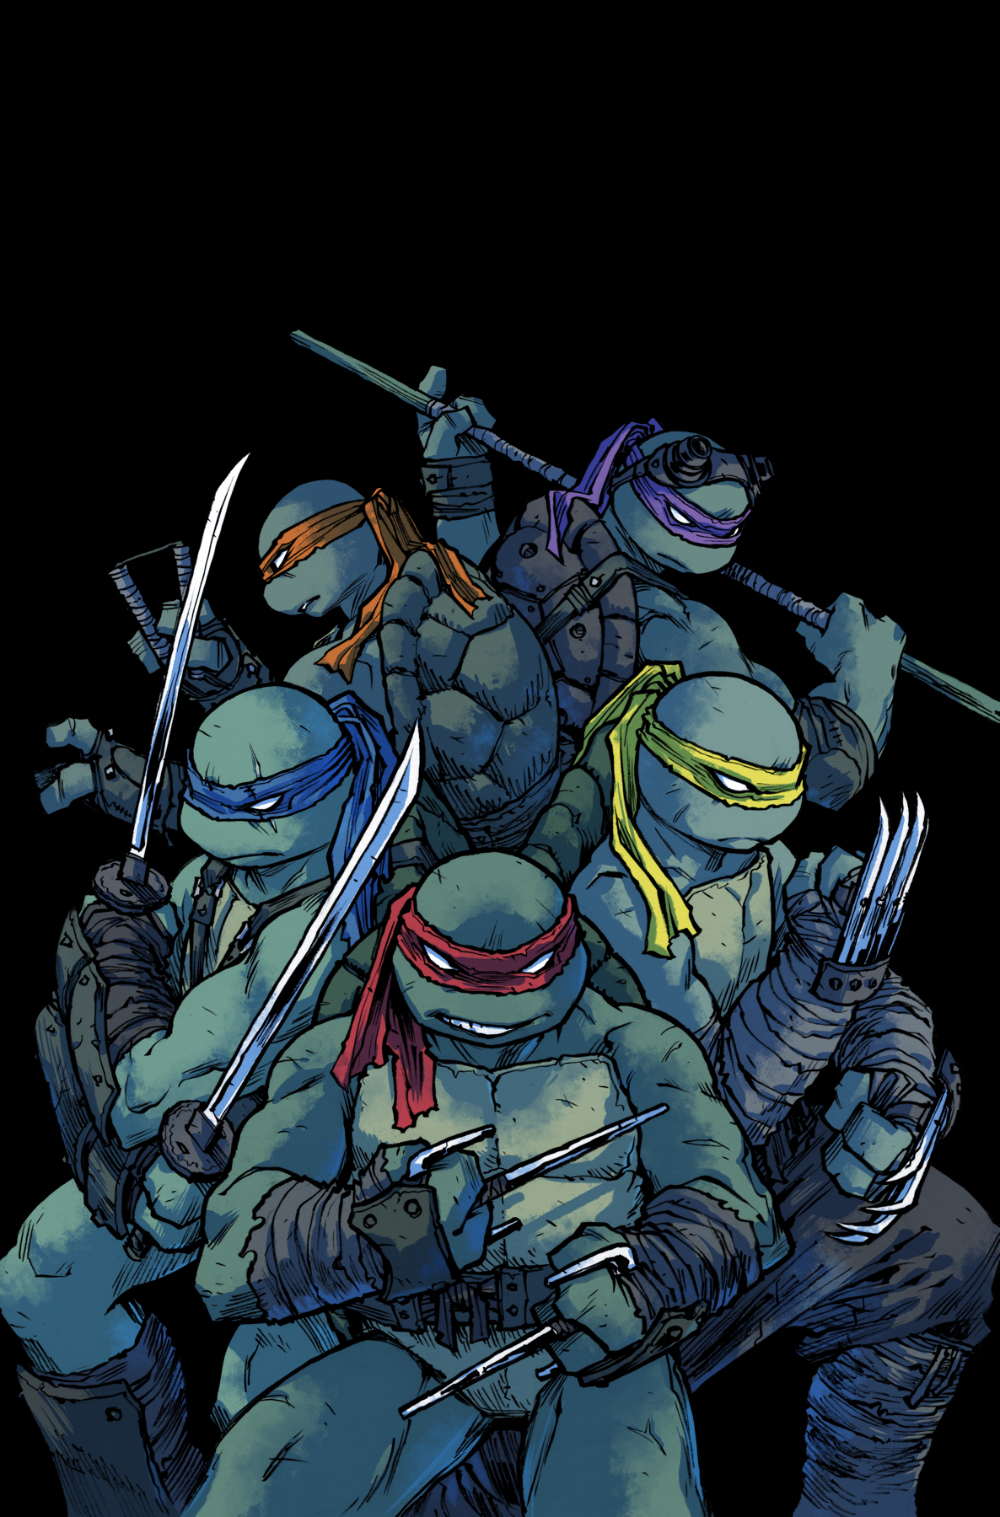 Sophie Campbell Teenage Mutant Ninja Turtles Idw Comics 1186x1800 Wallpaper Wallhaven Cc Ninja Turtles Tmnt Teenage Mutant